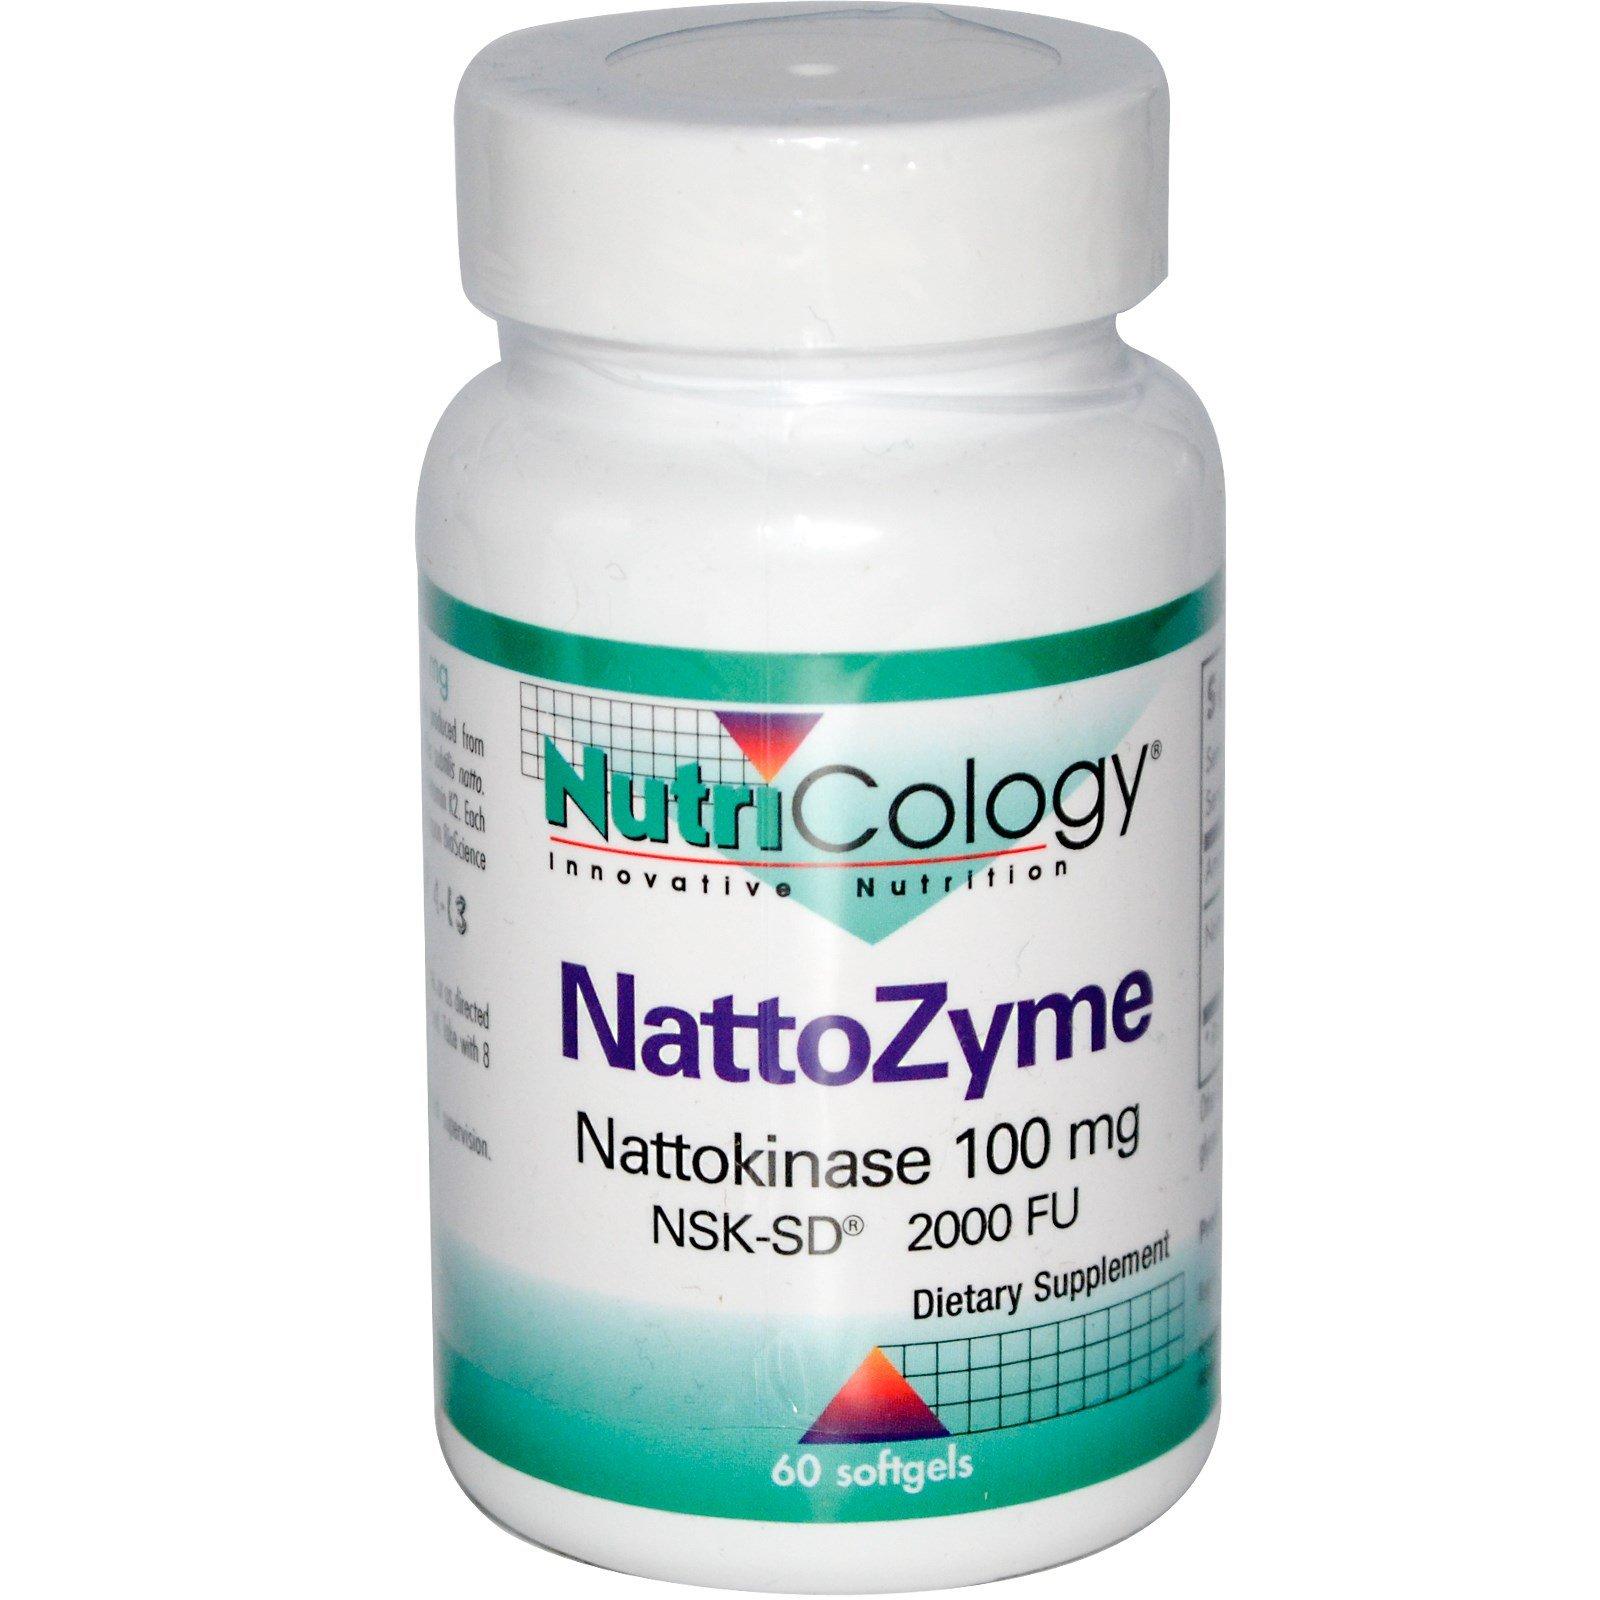 Nutricology, NattoZyme, Nattokinase, 100 mg, 60 Softgels - 3PC